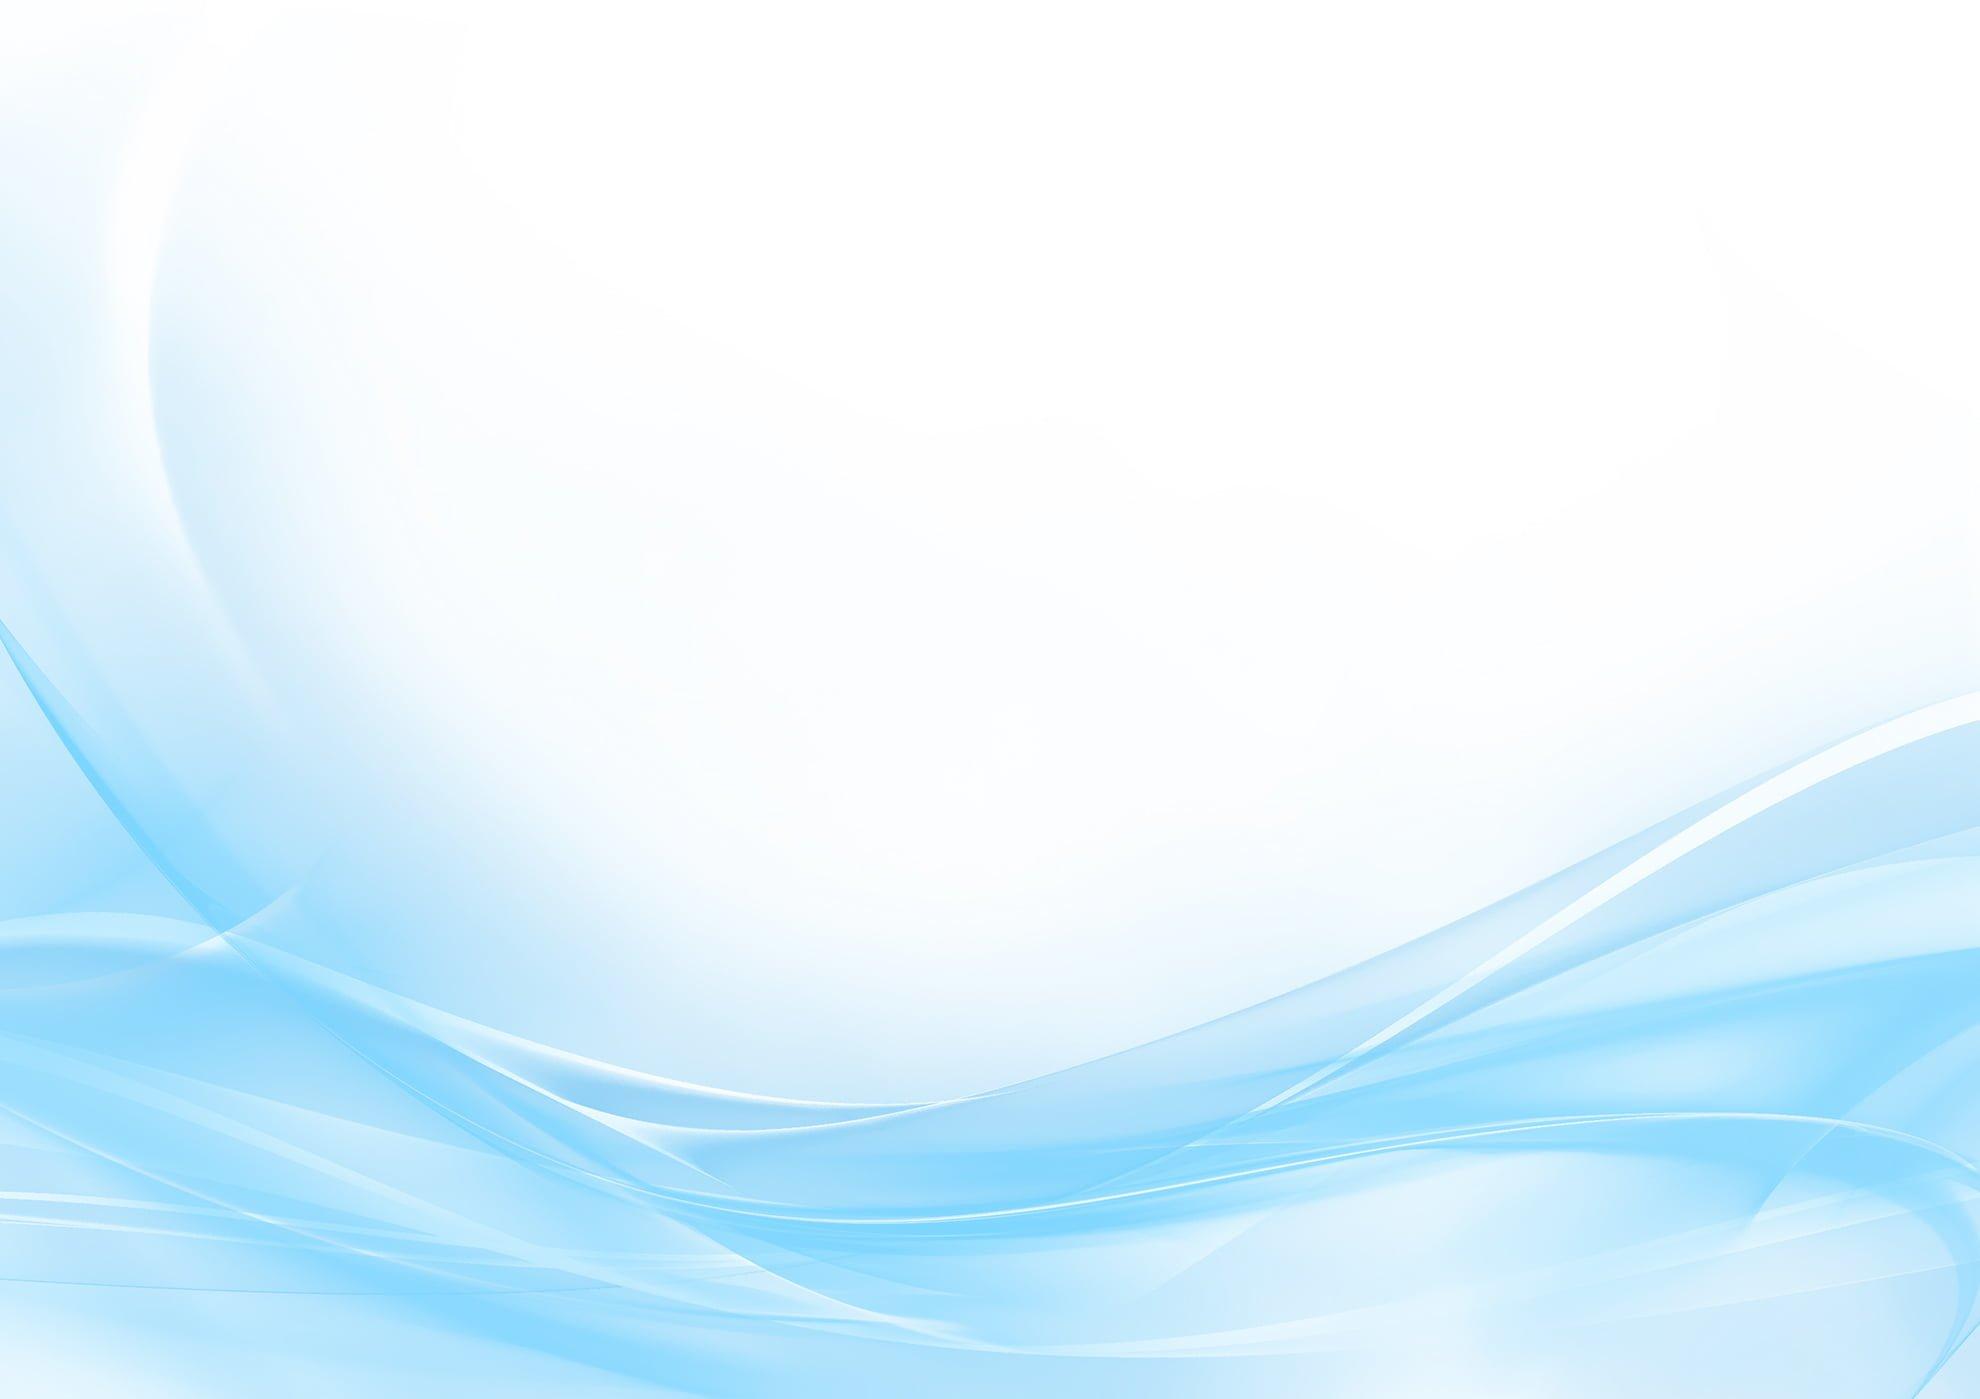 White blue background